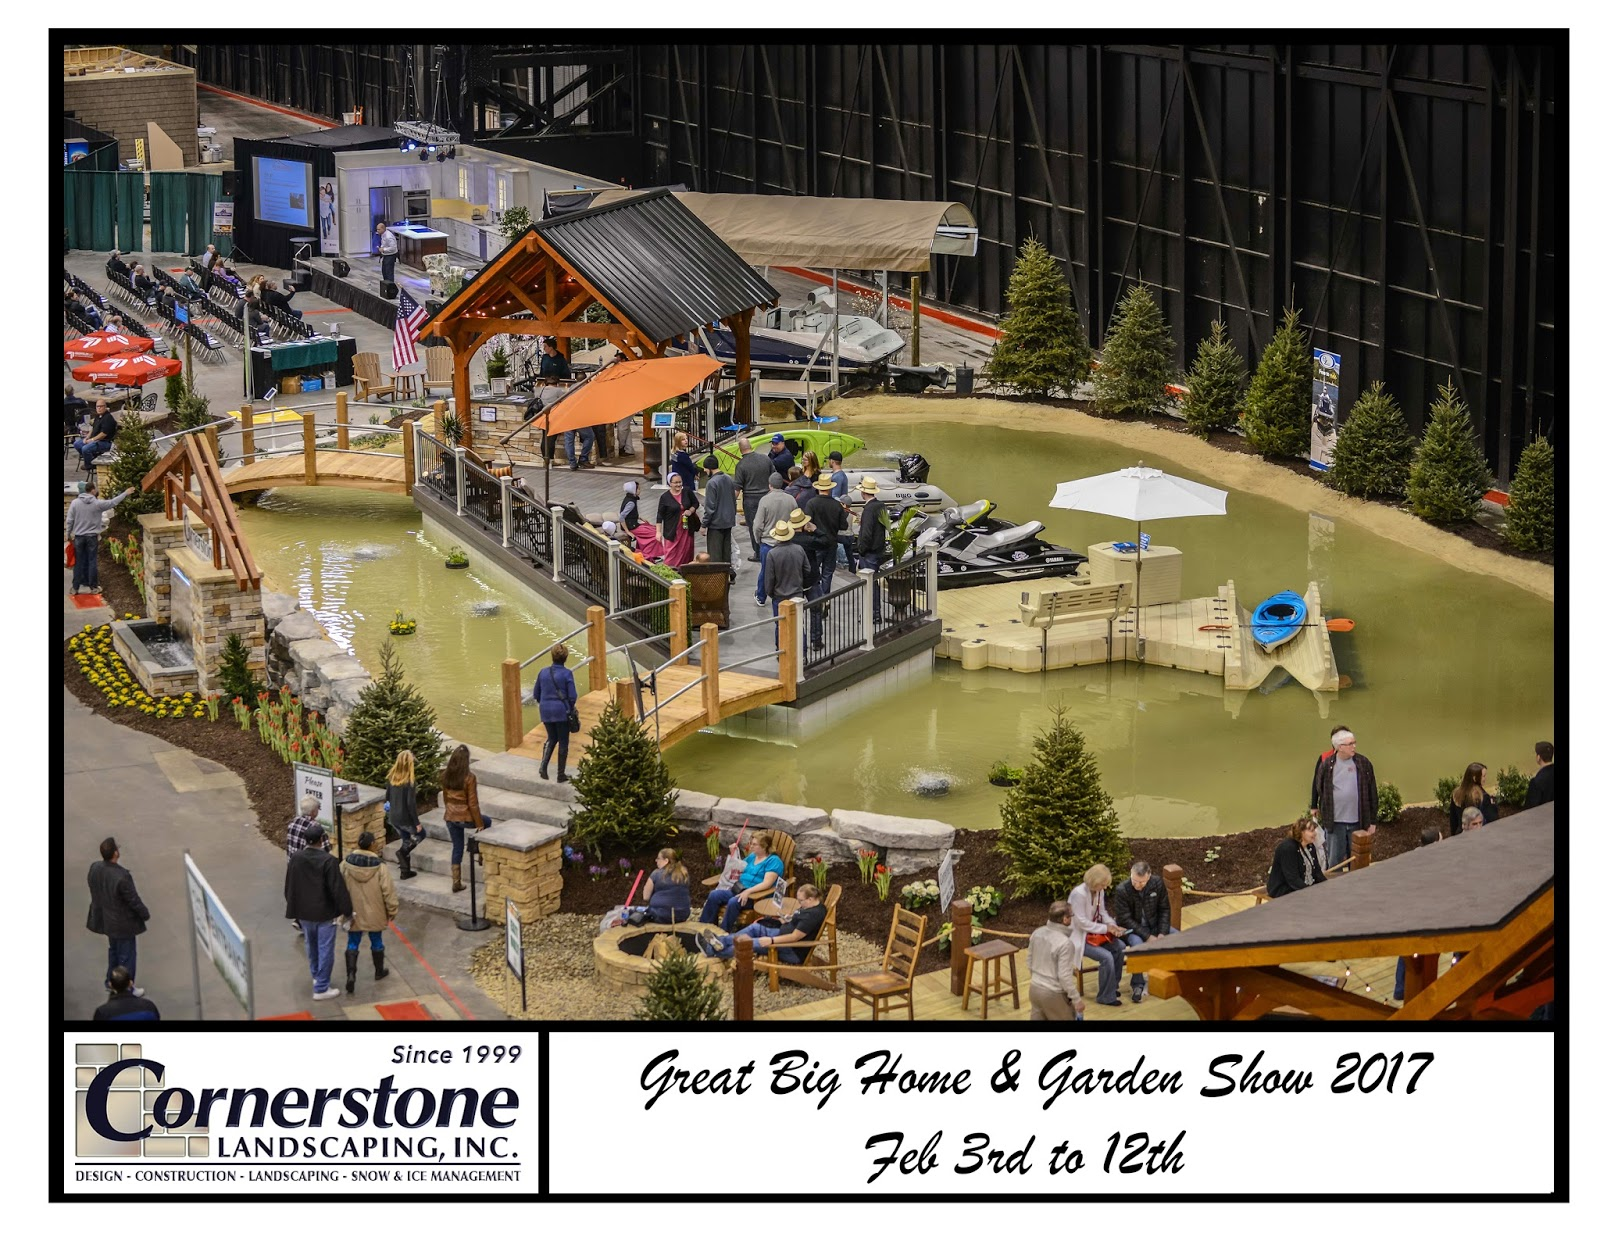 Cornerstone Landscaping, Inc : EZ Port PWC lift | Ohio EZ